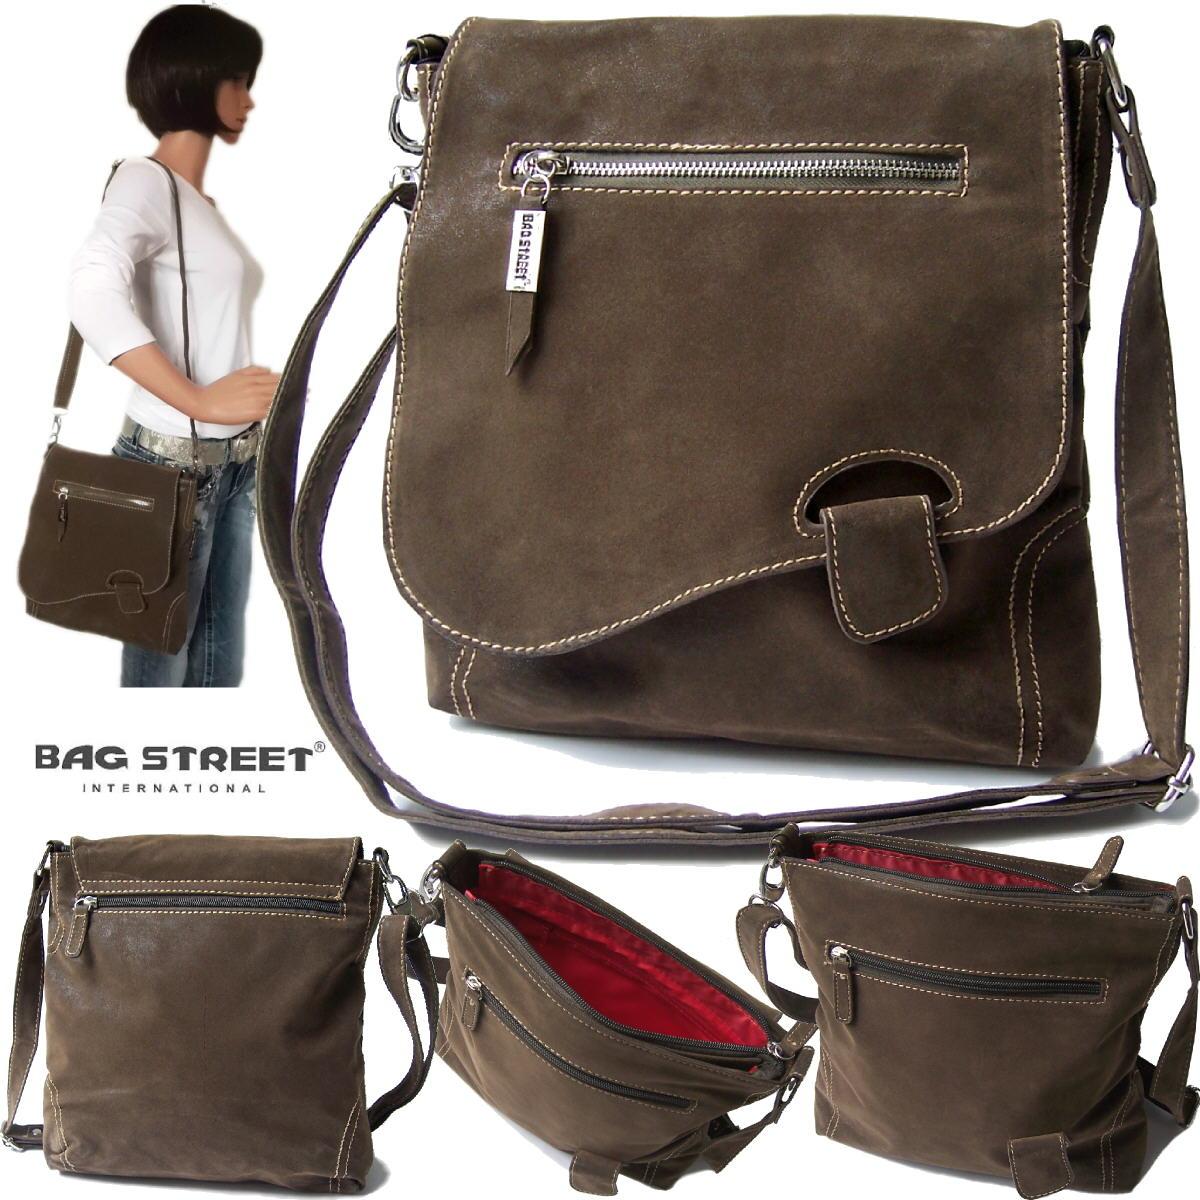 Tasche Umhängetasche Handtasche Leder-Look braun Bag Street Ta6041